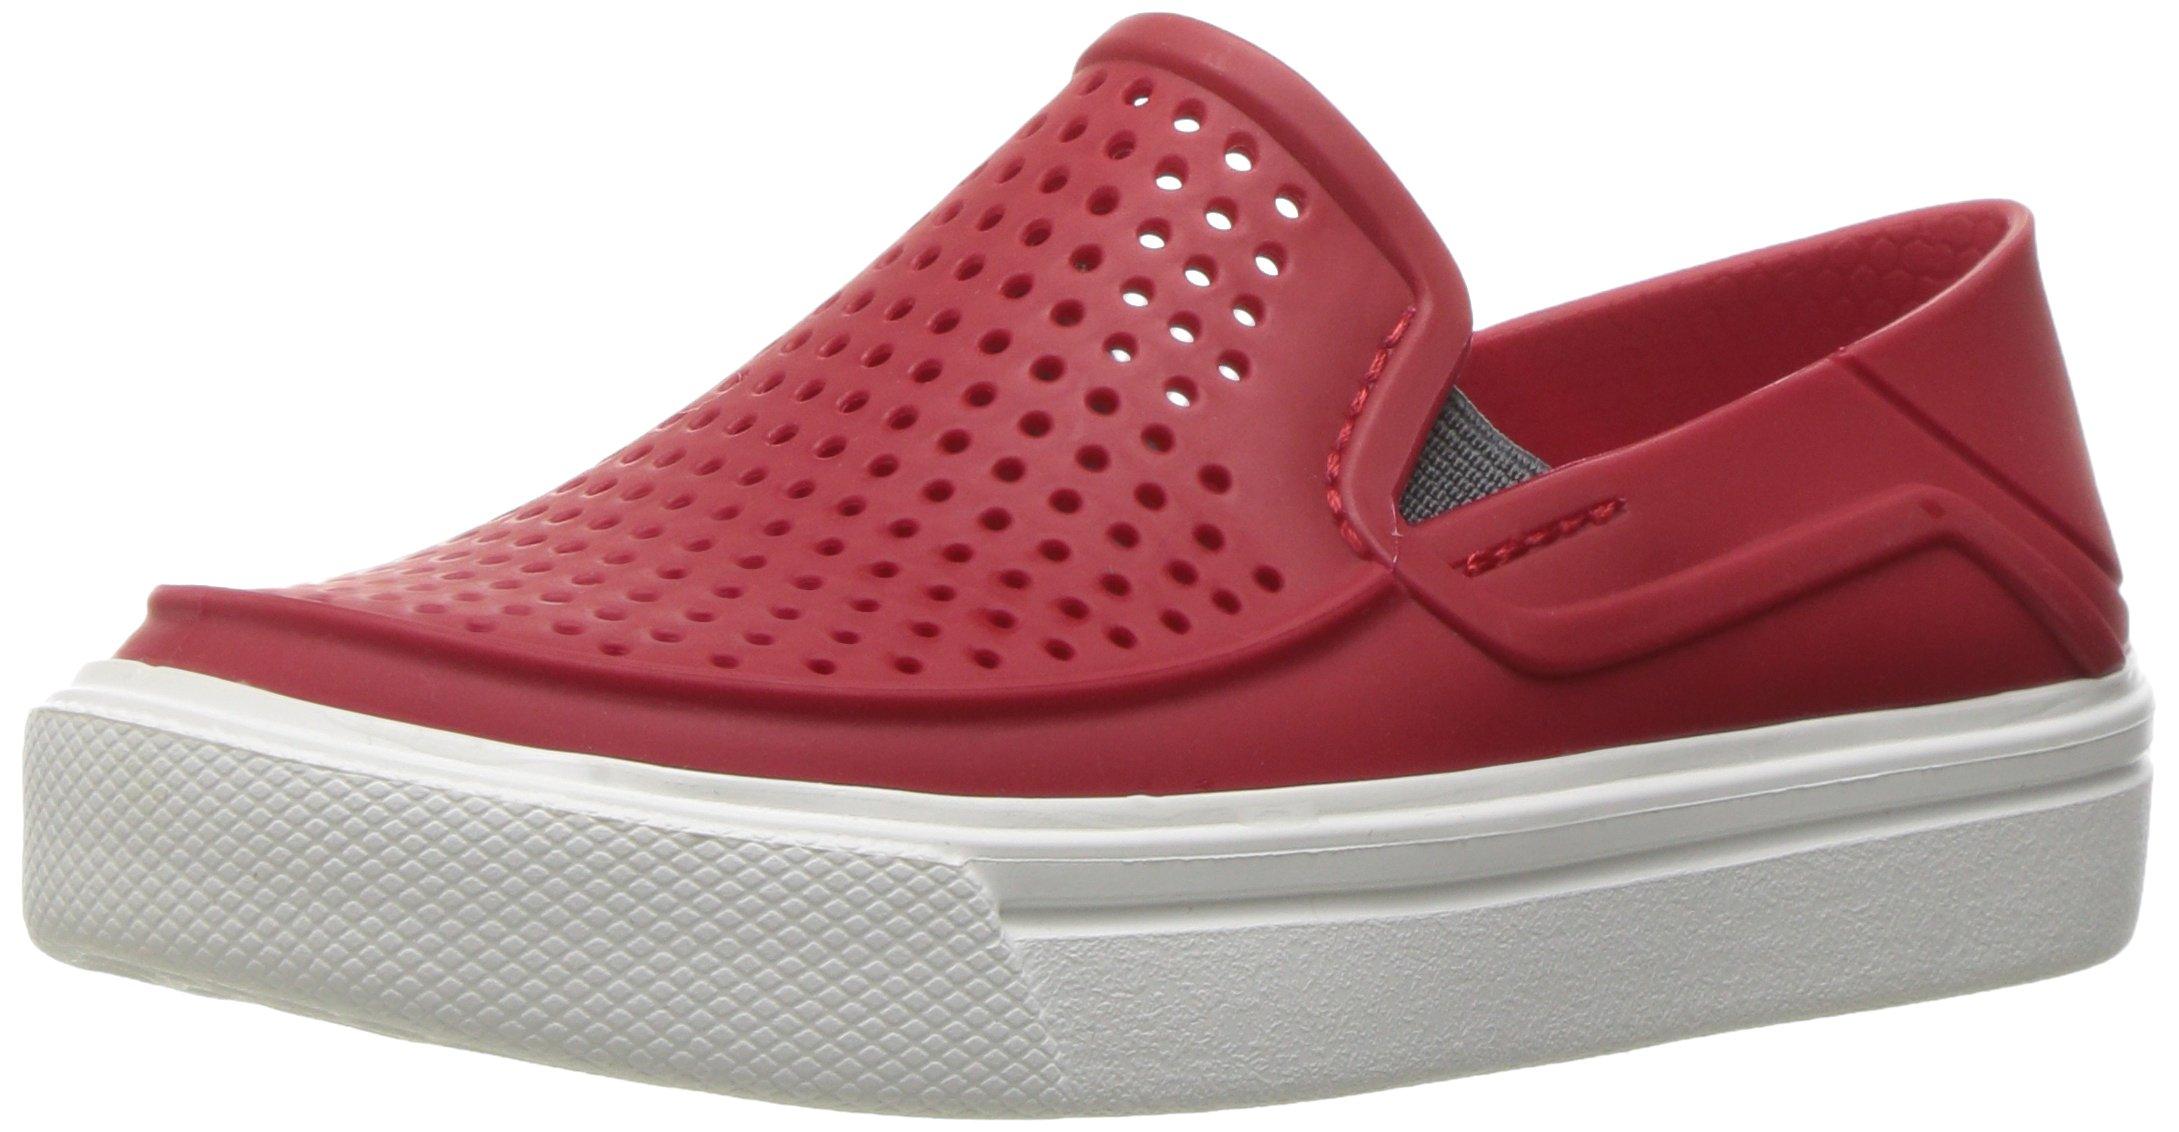 Crocs Kids' Citilane Roka K Flat, Pepper, 7 M US Toddler